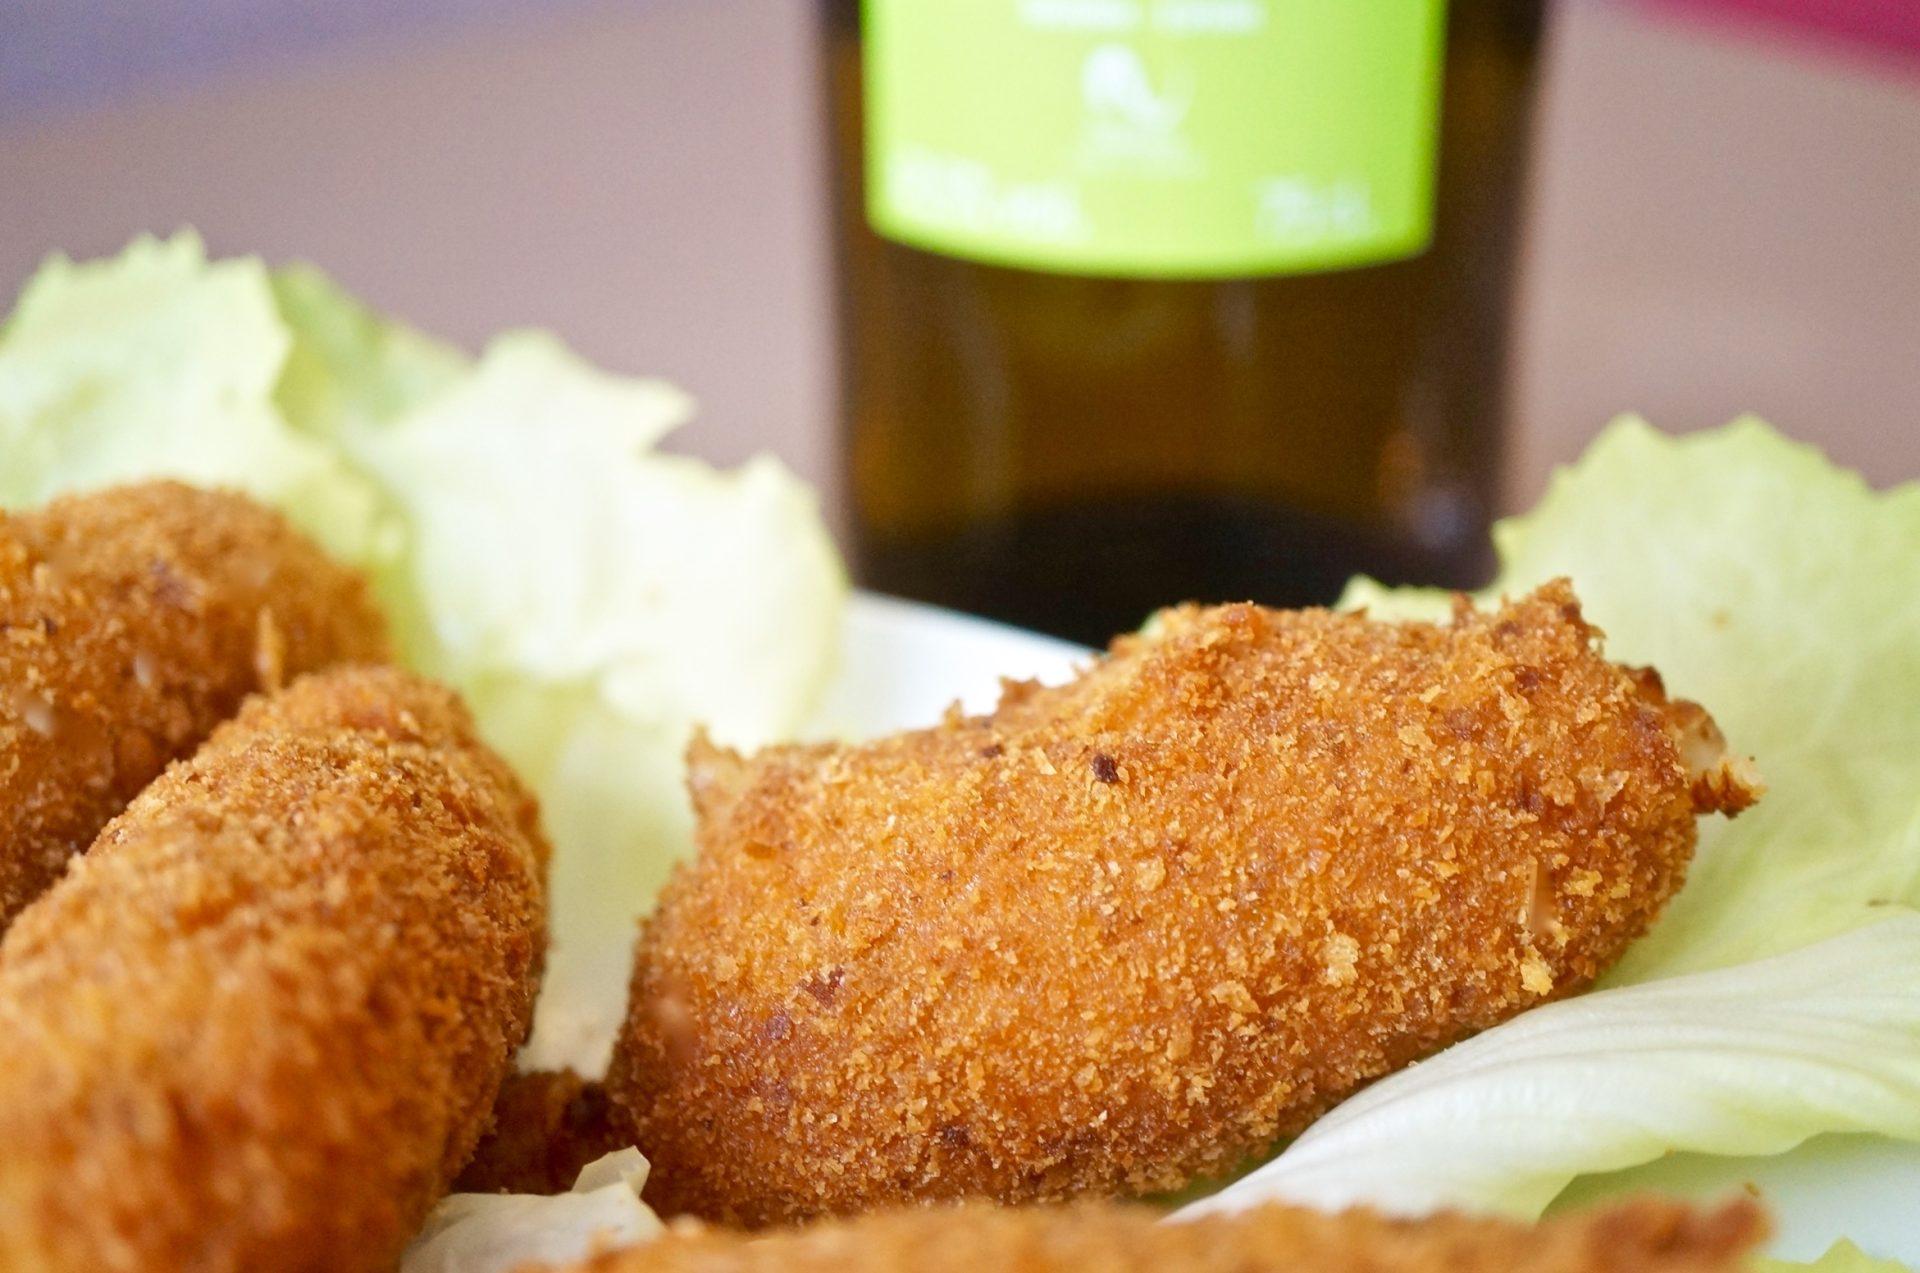 Croquetas Pollo – Spanische Hühnchenkroketten